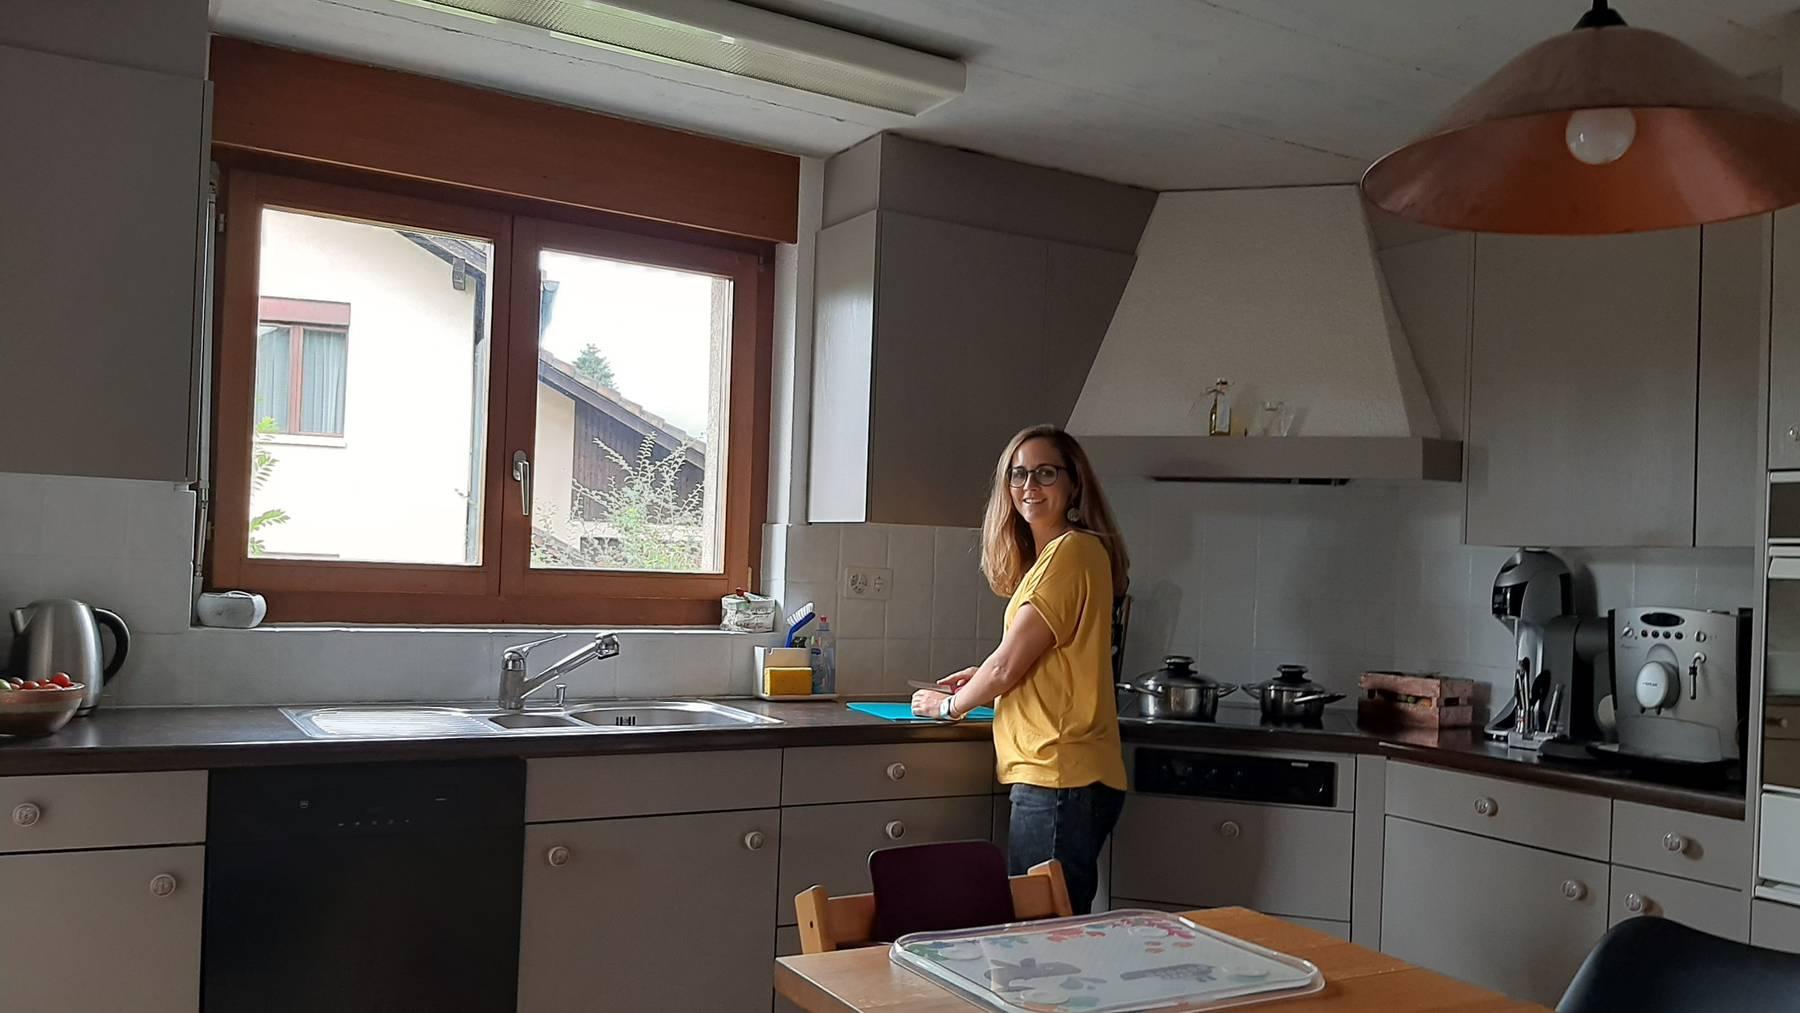 Flavia Burri aus Hochdorf